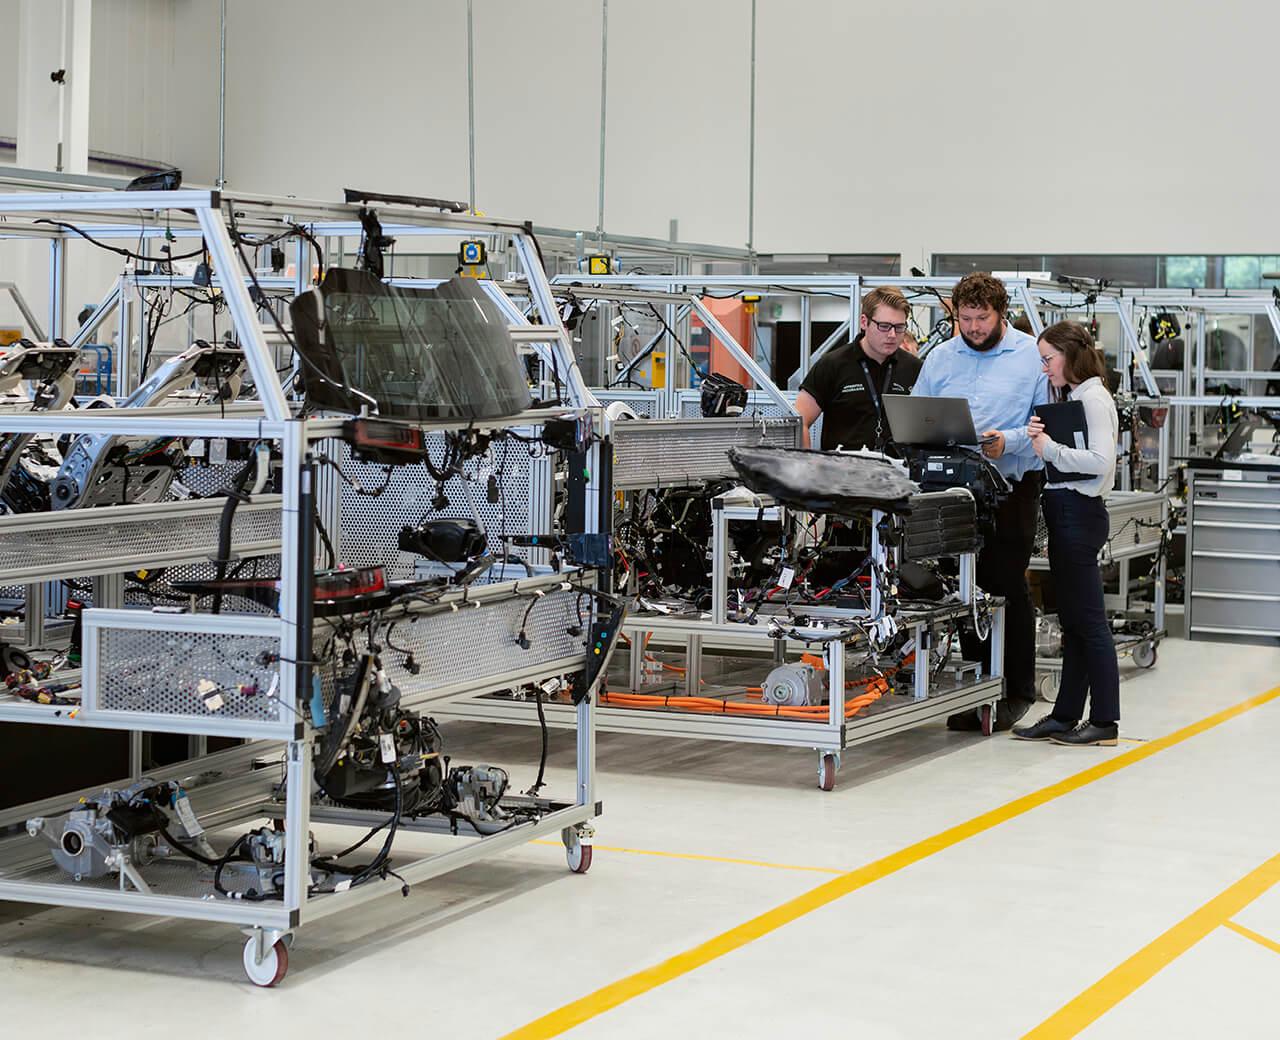 3 TT Electronics employees in a factory